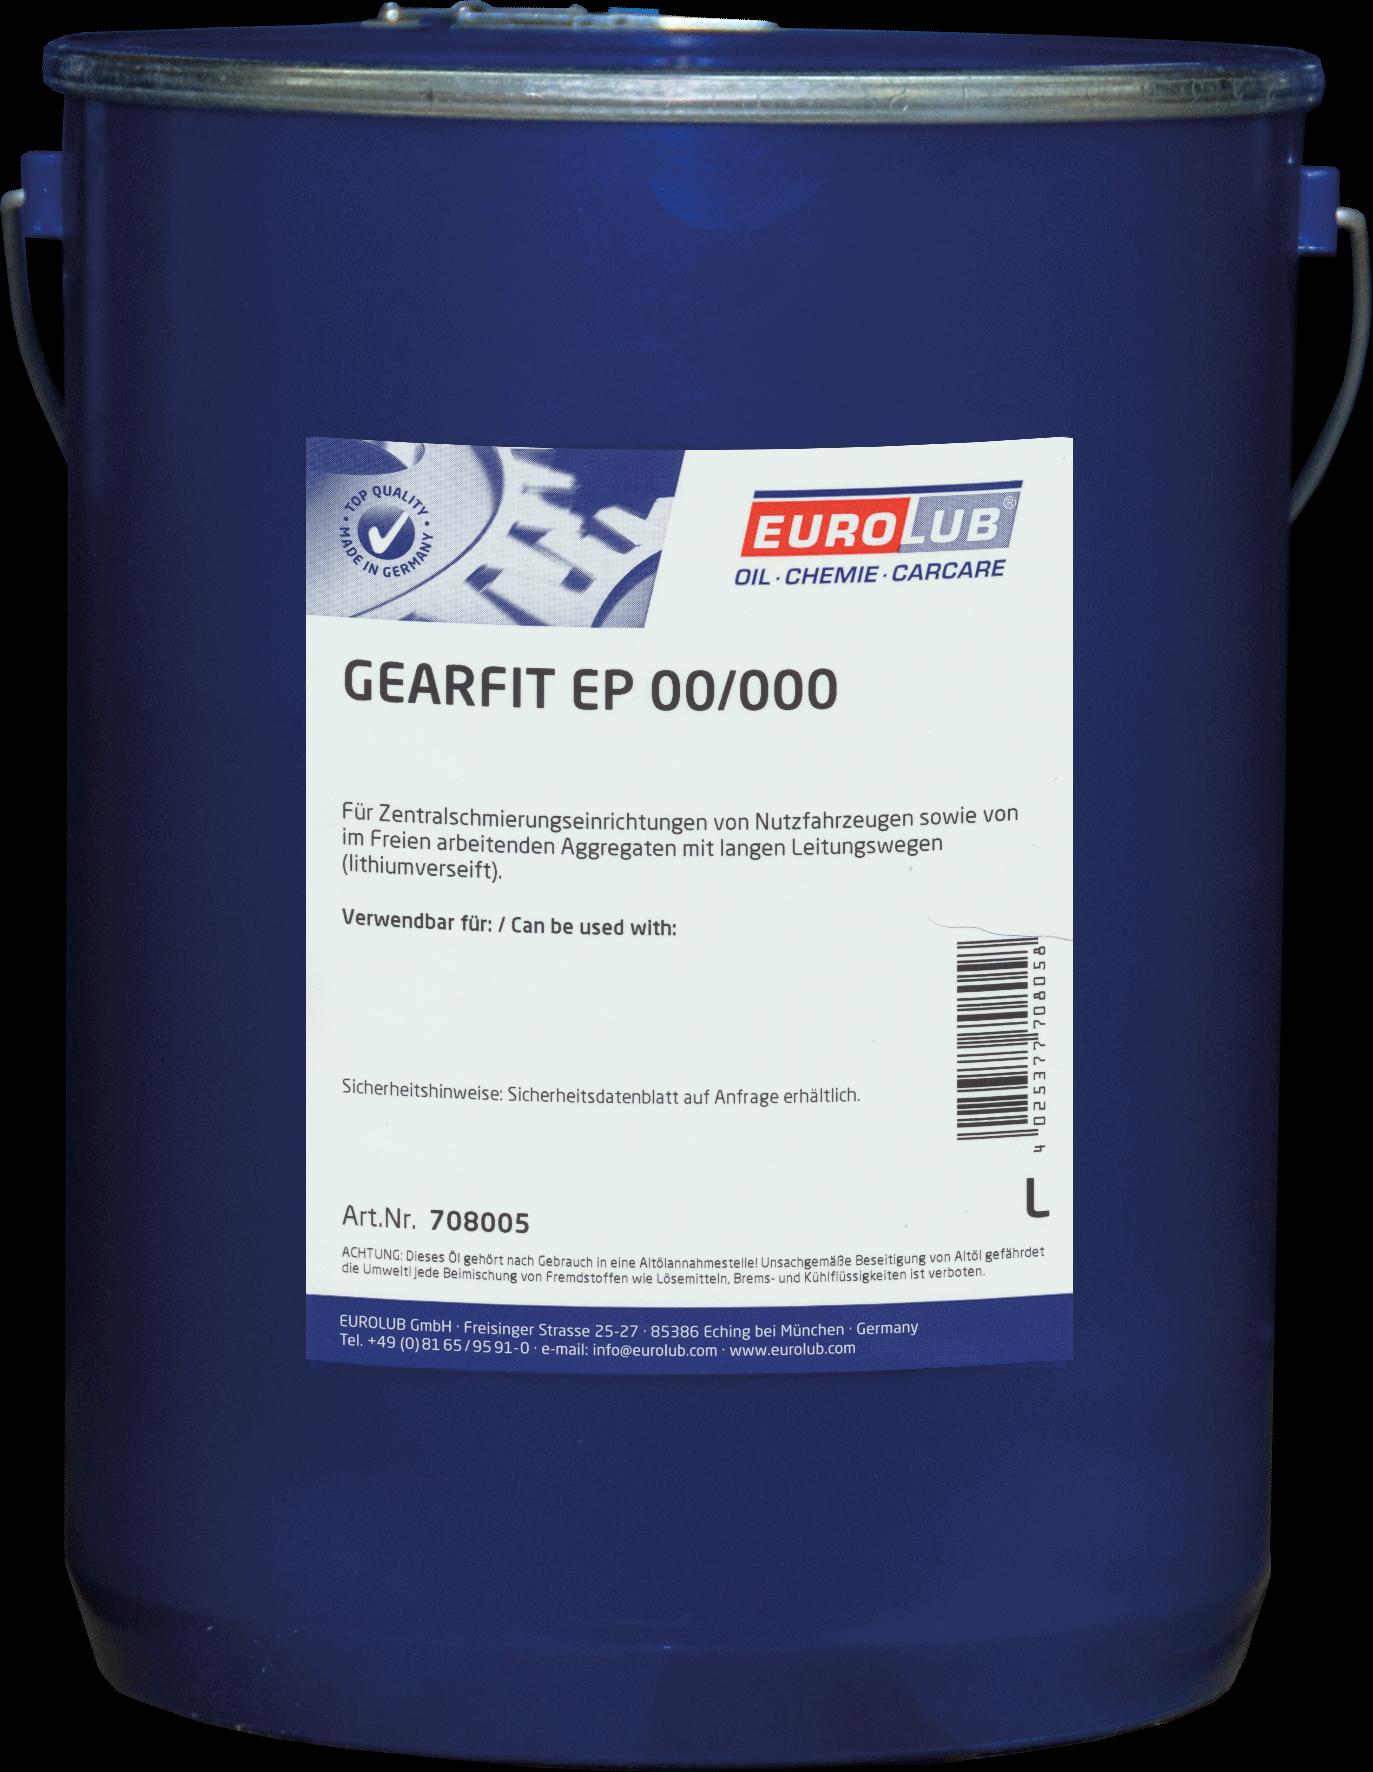 Eurolub Gearfit EP00/000 (смазка для централизованных систем), 5л